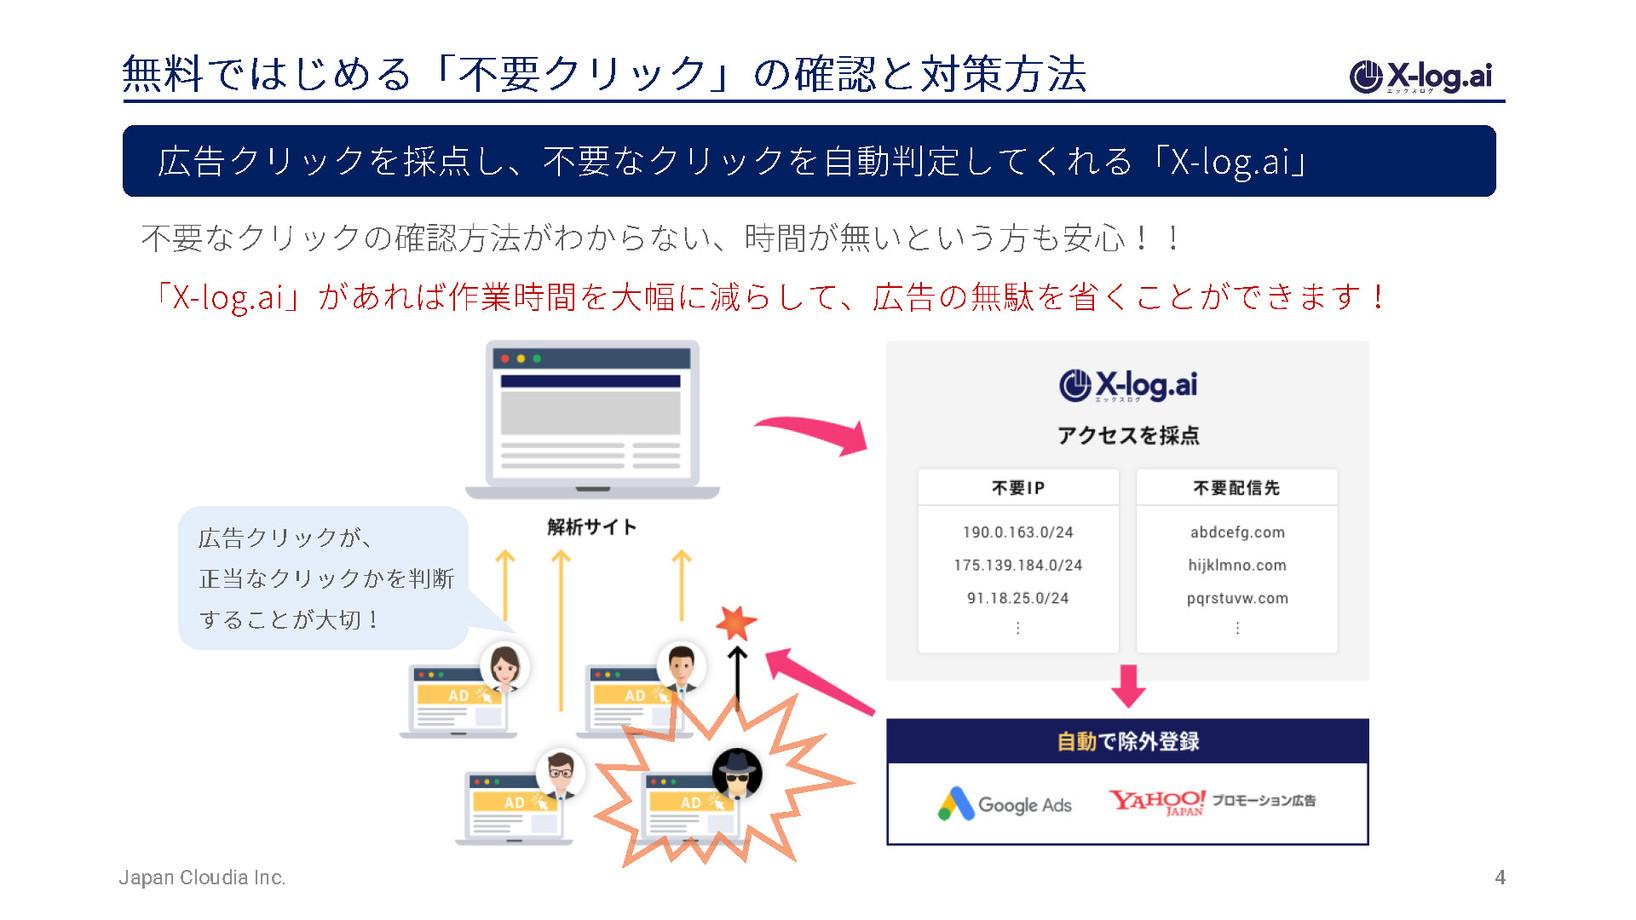 X-log.aiご案内資料_ページ_04.jpg